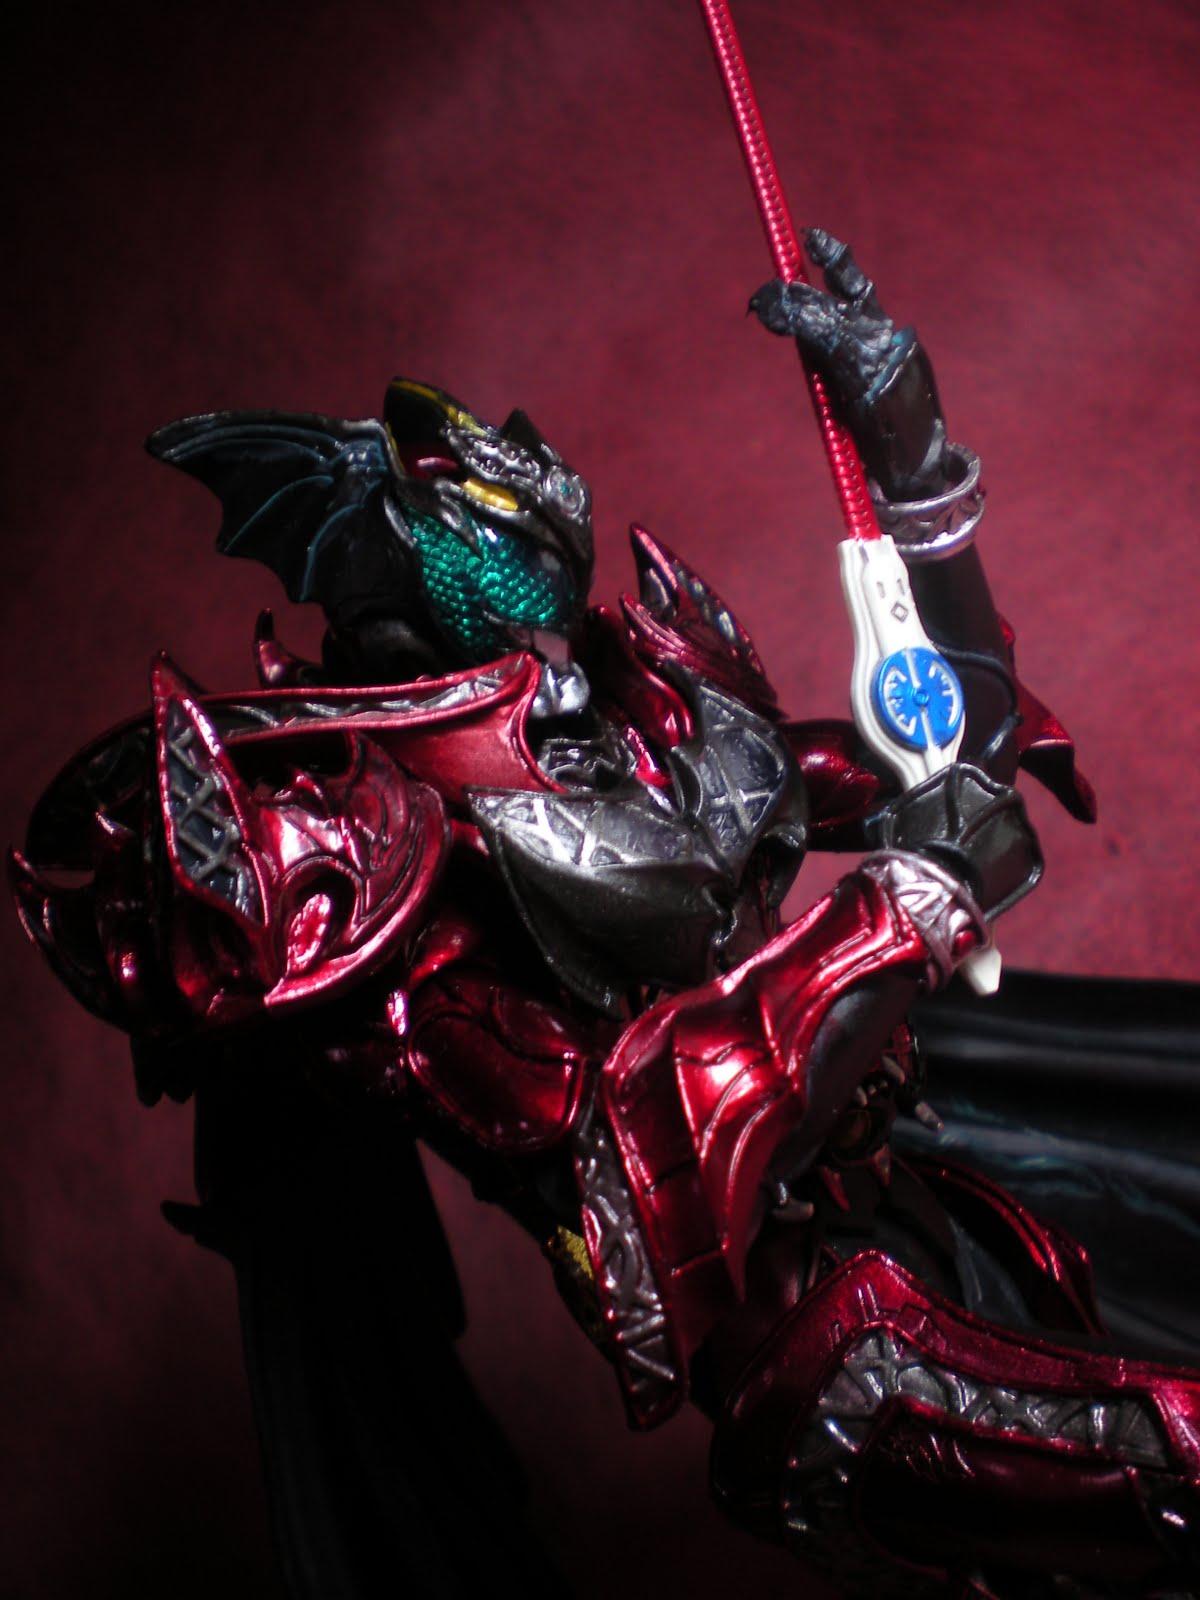 Kamen Rider Dark Kiva Sic 54 Kamen Rider Dark Kiva